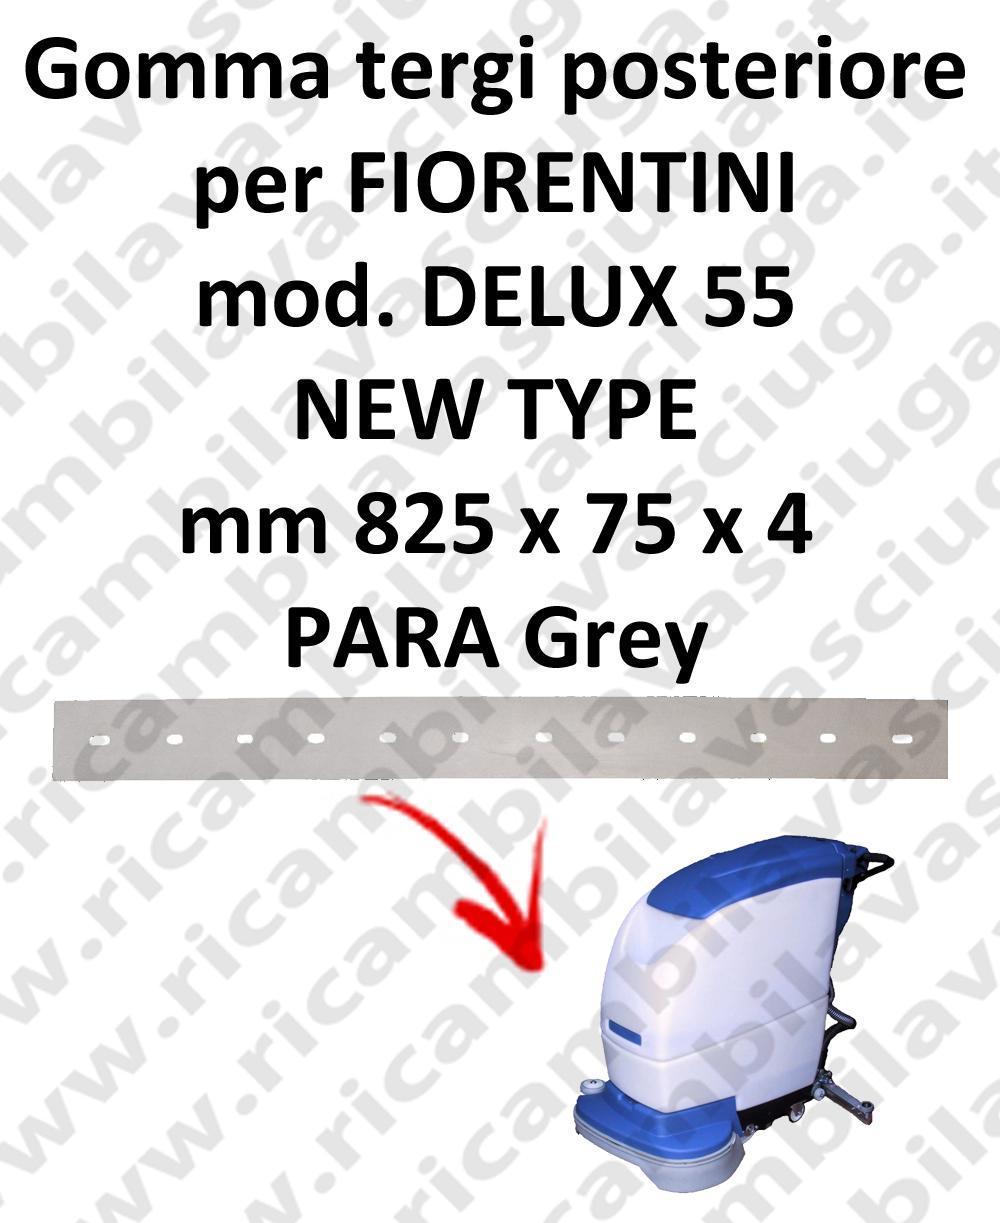 DELUX 55 new type BAVETTE ARRIERE pour autolaveuses FIORENTINI